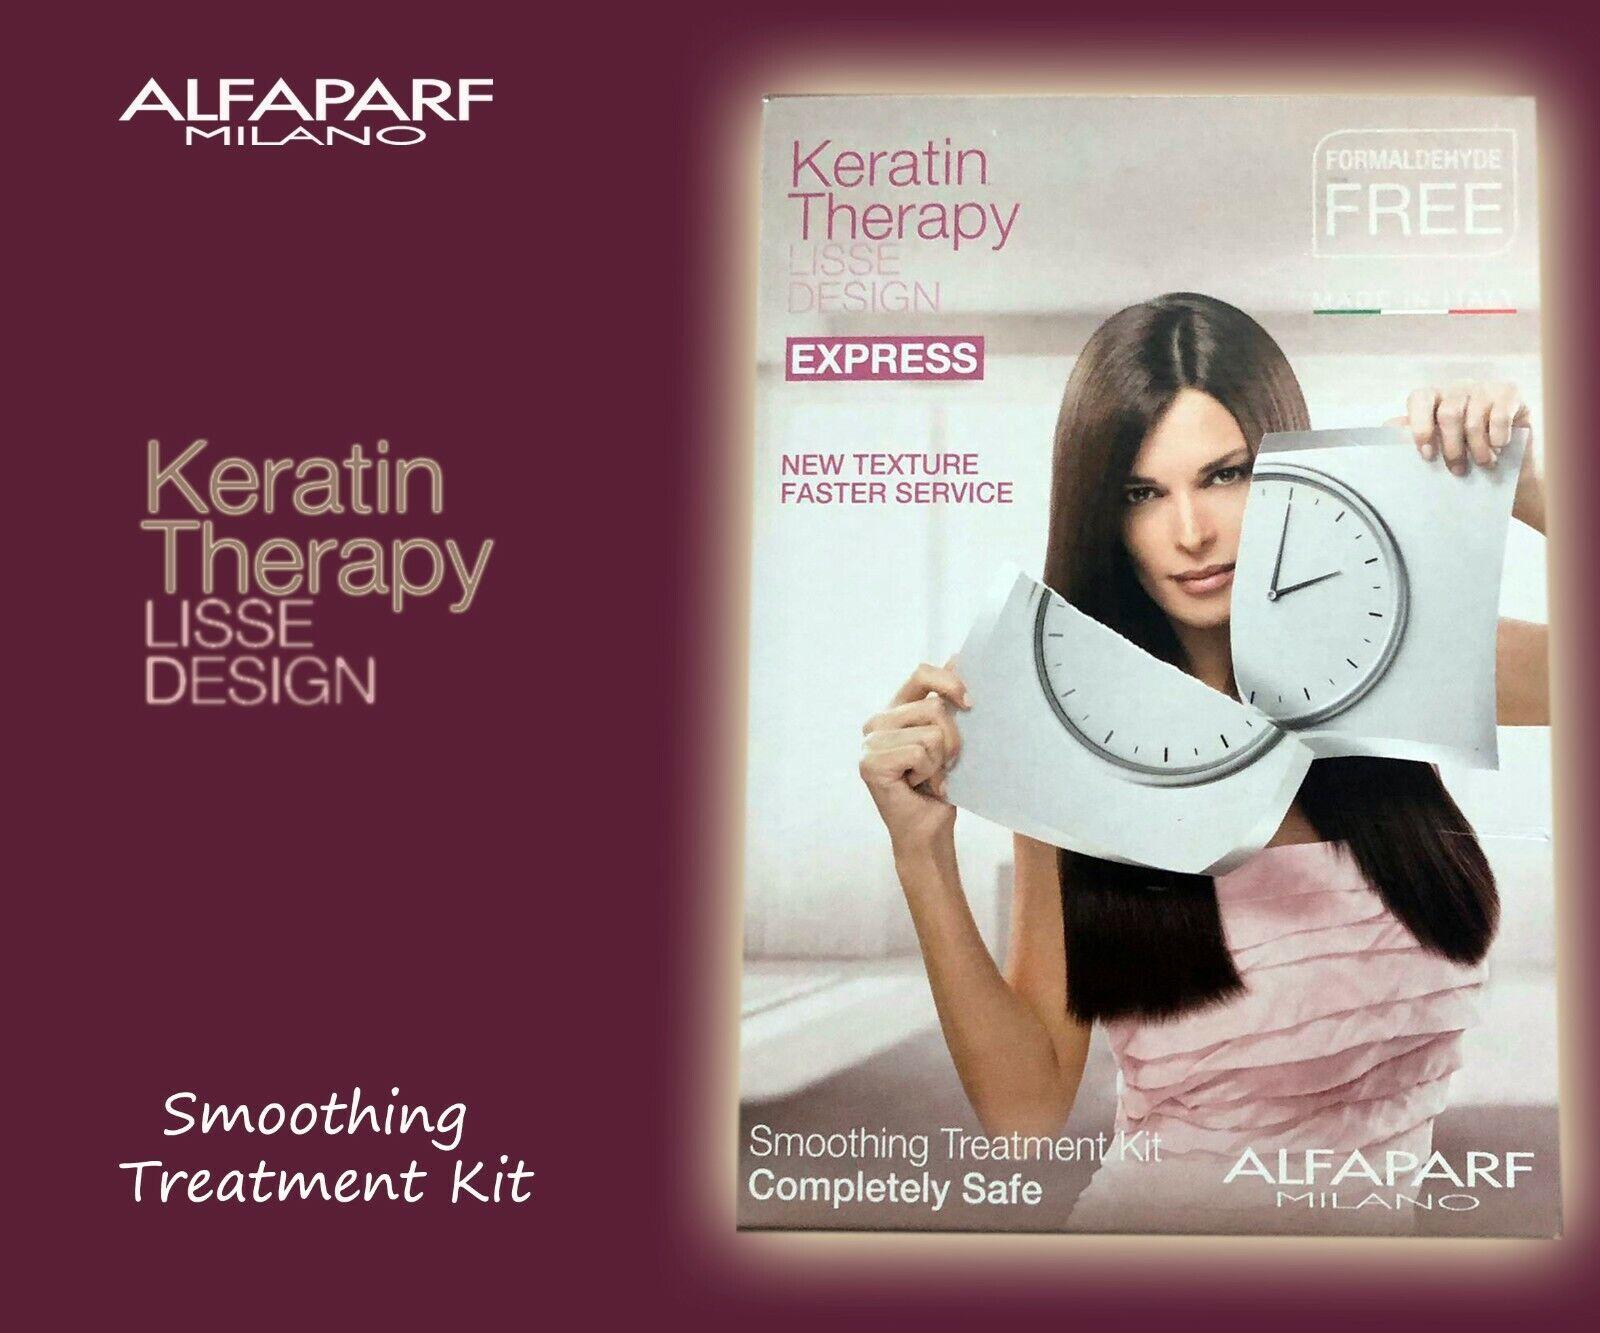 ALFAPARF MILANO Keratin Therapy Lisse Desing Smothing Treatm